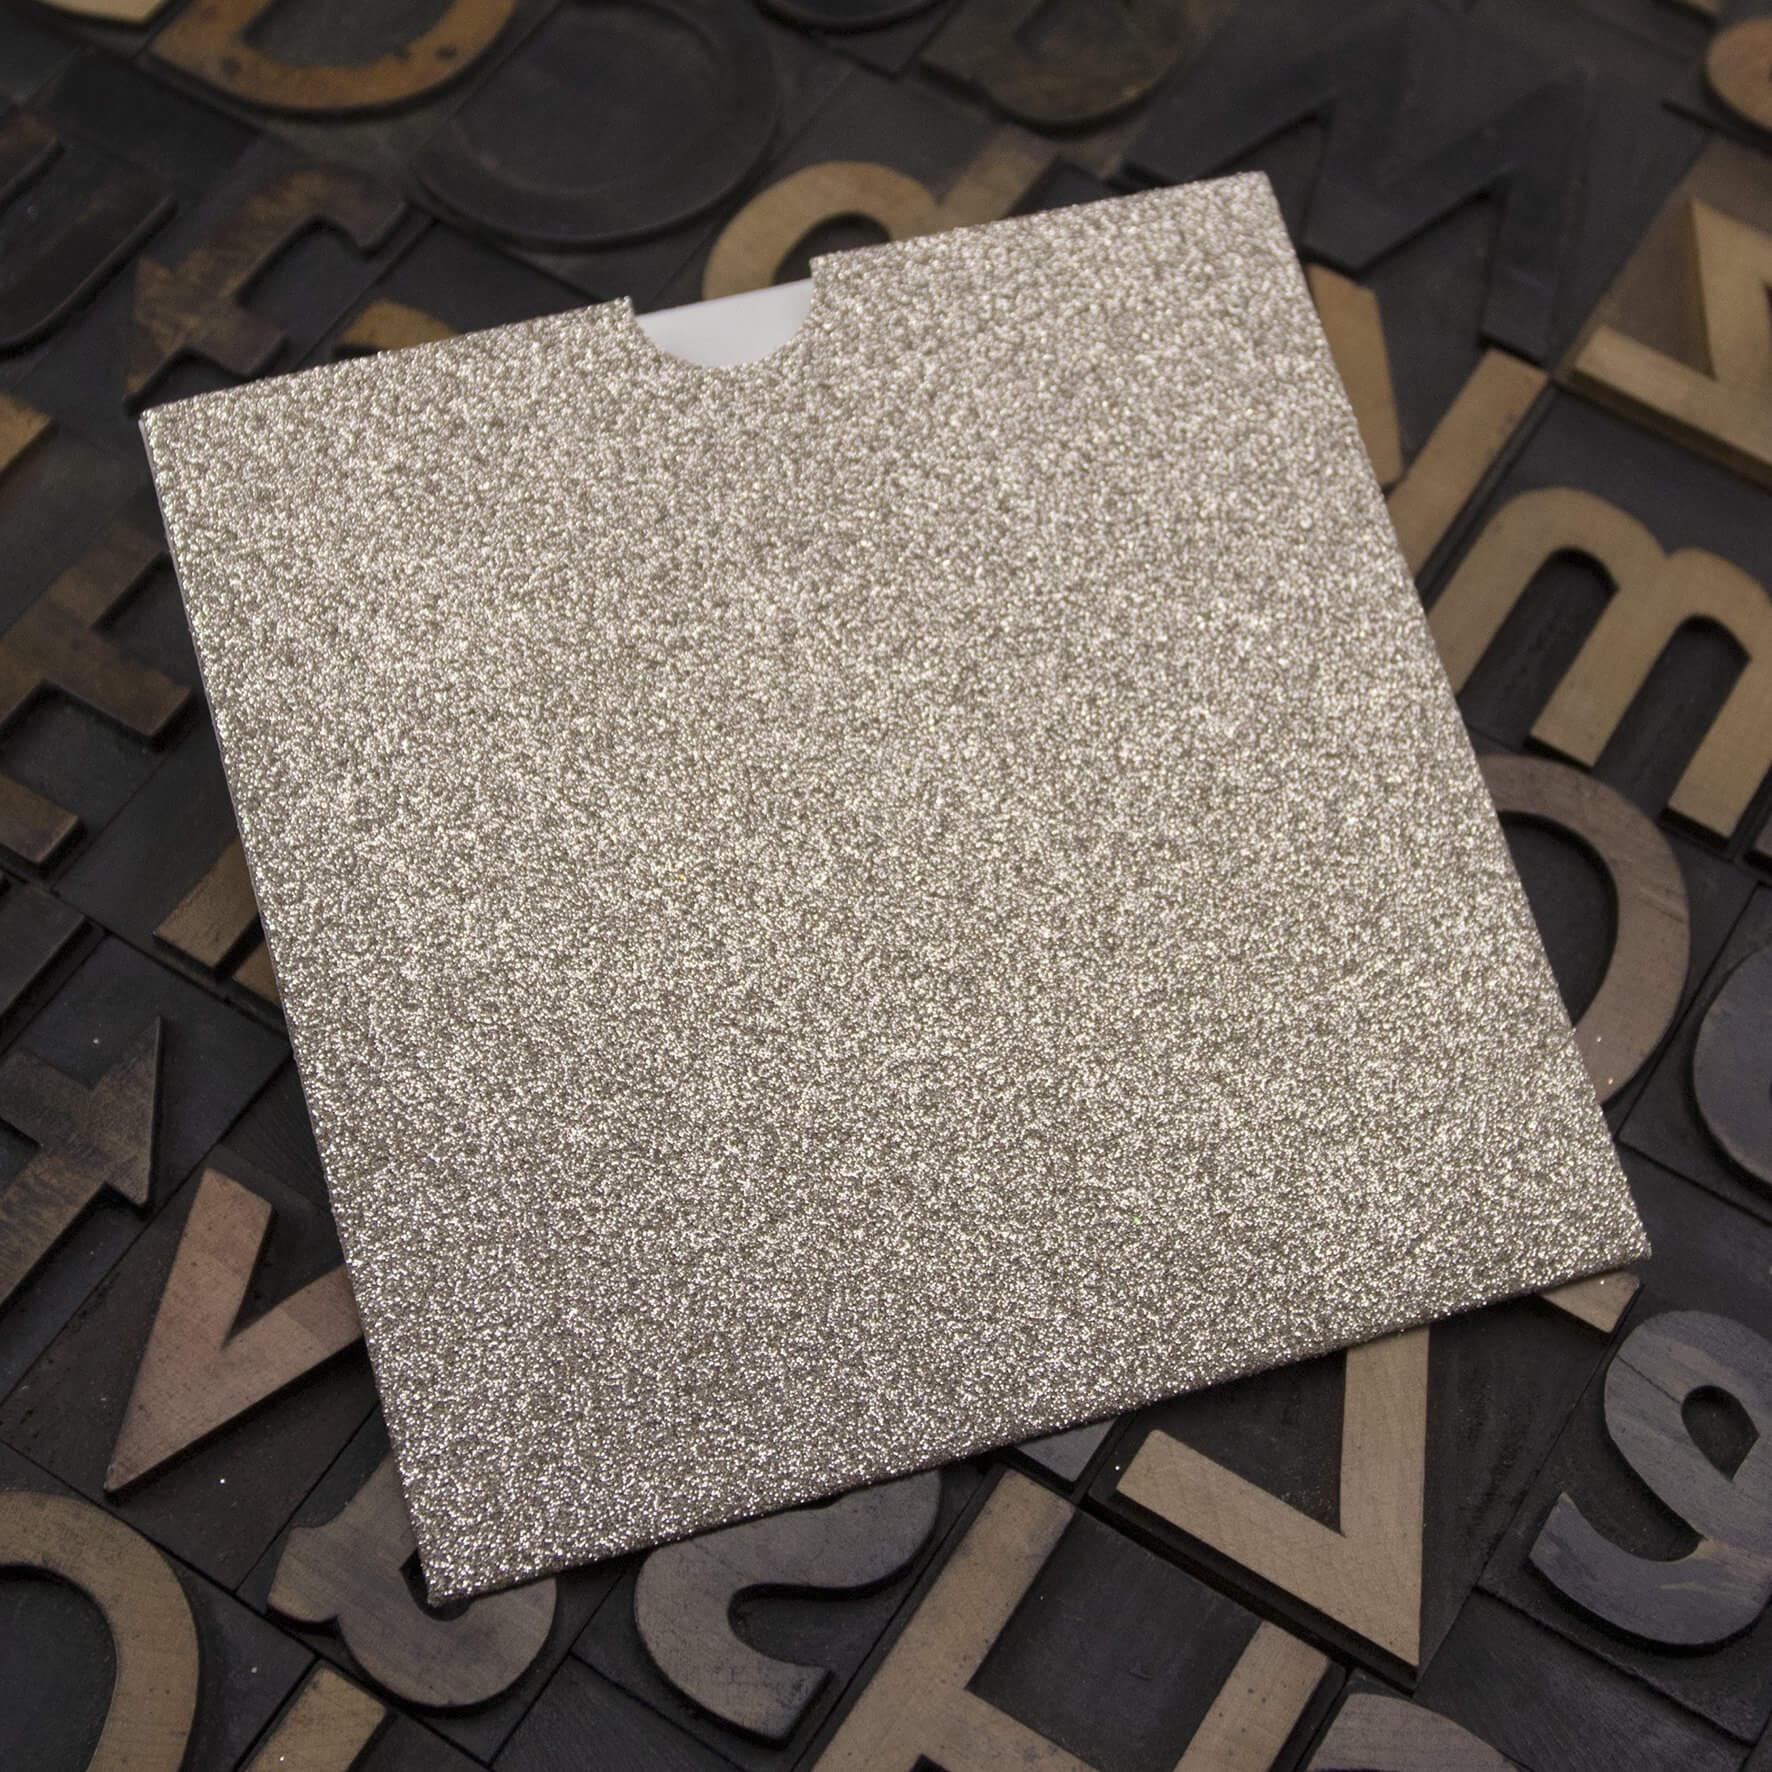 Enfolio Wallet 125mm Sq - Champagne Supernova Glitter Card